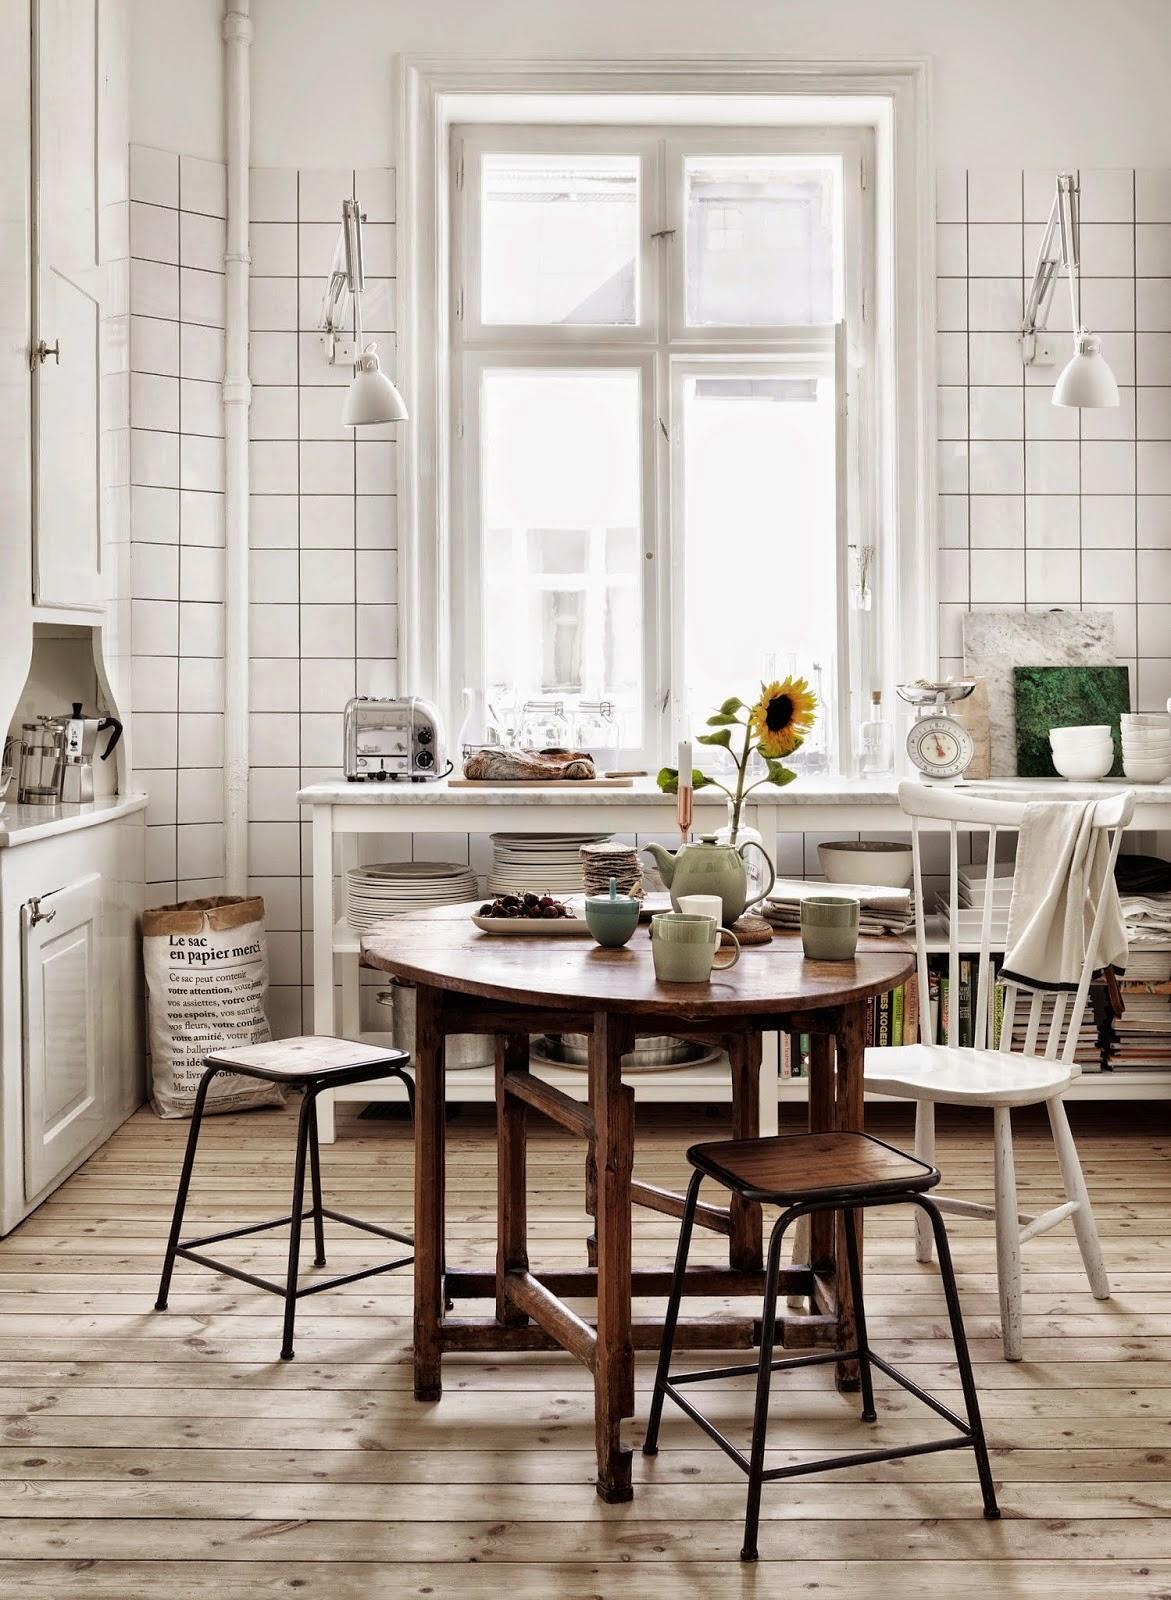 Cuisine inspiration scandinave